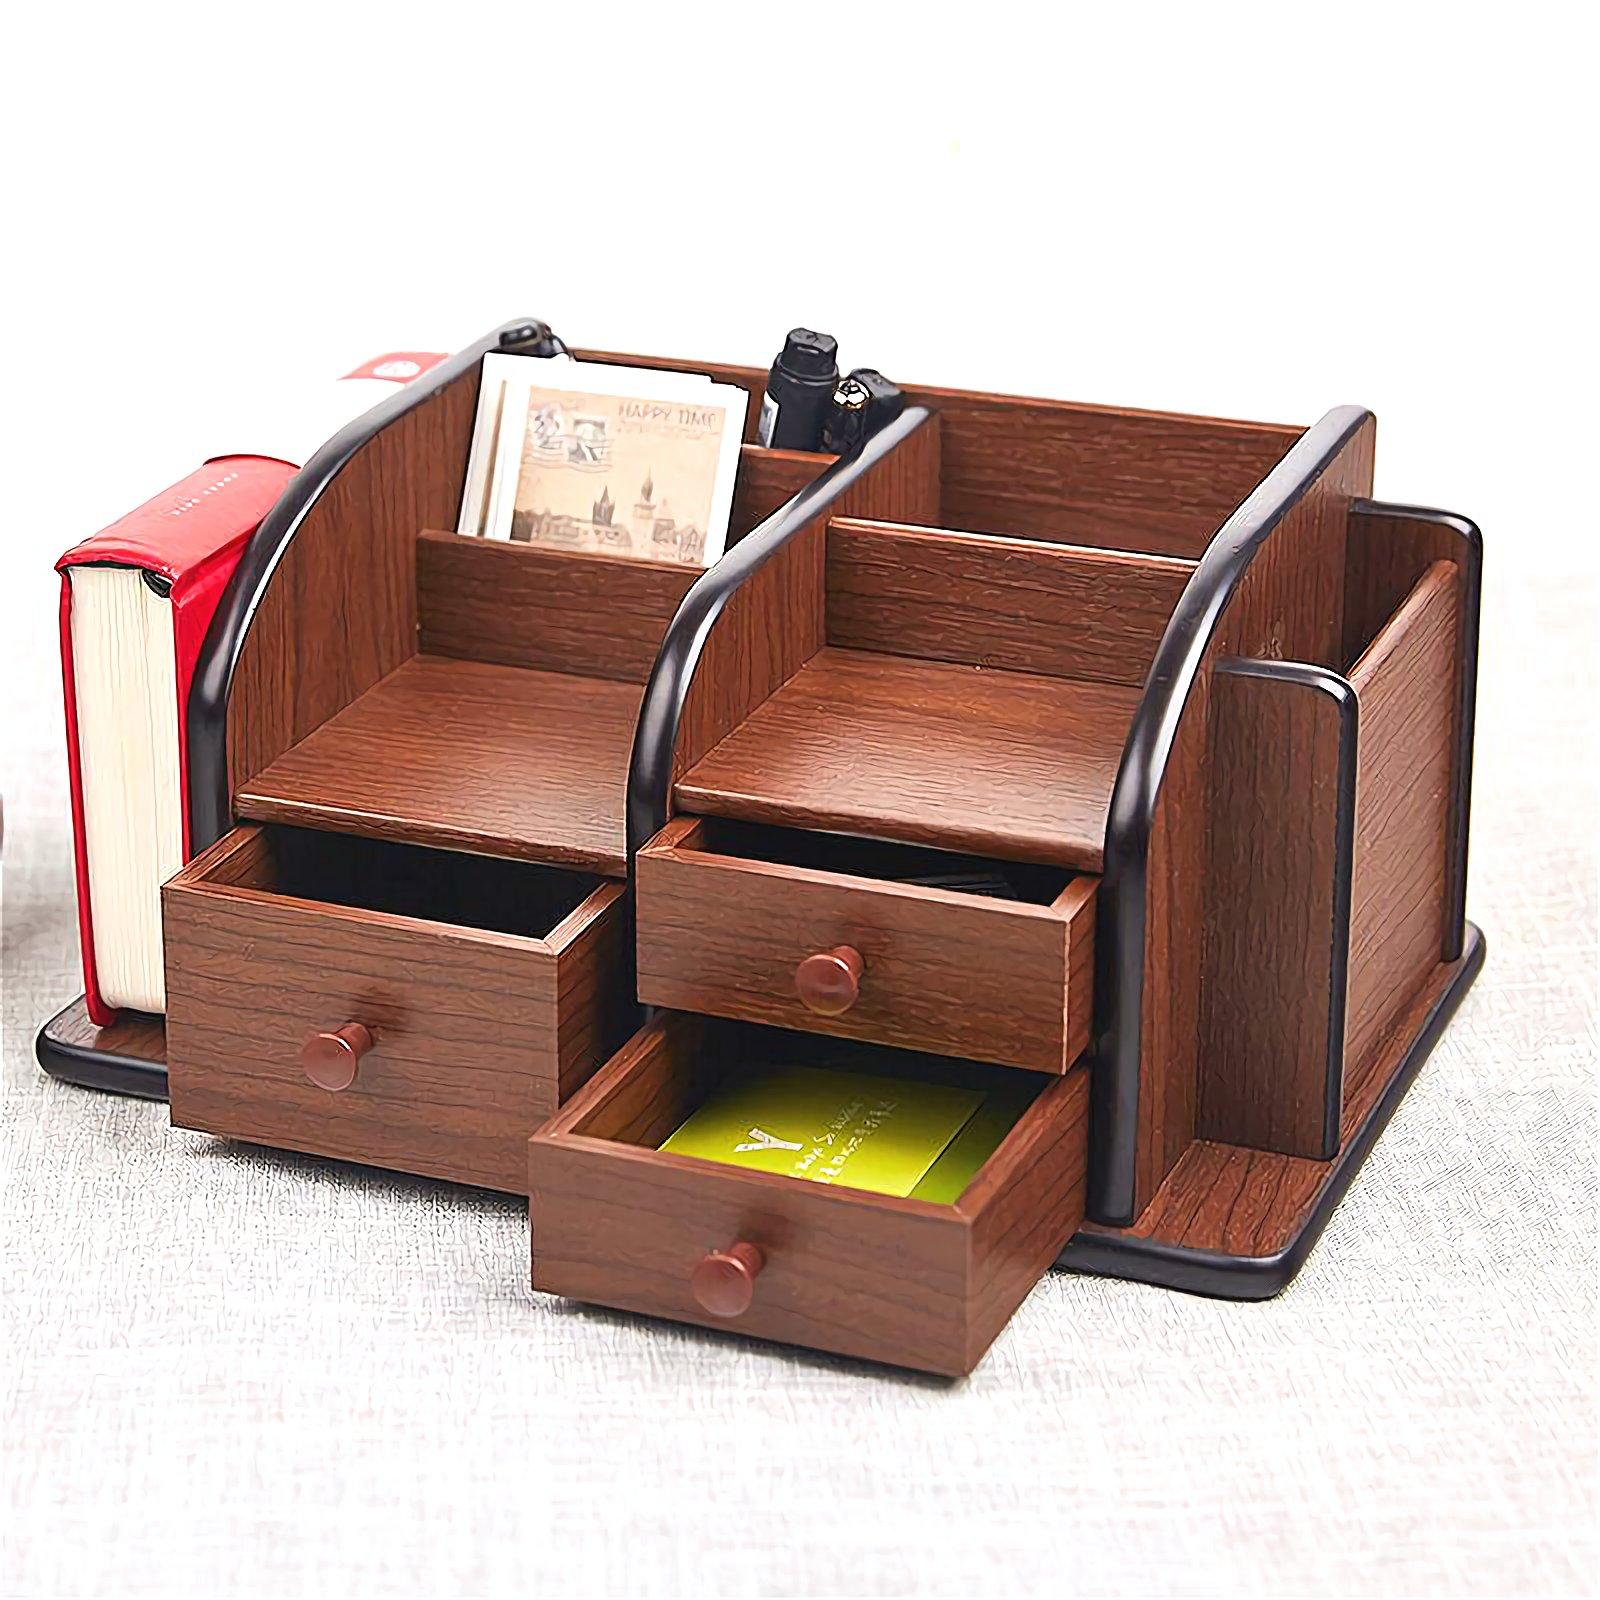 Siveit Wooden Desk Organizer, Wood Desktop Organizer with 3 Drawers 2 Shelves and 3 Compartments Office Supplies Holder Desk Accessories (Desk Organizer-3+3+2) by Siveit (Image #5)